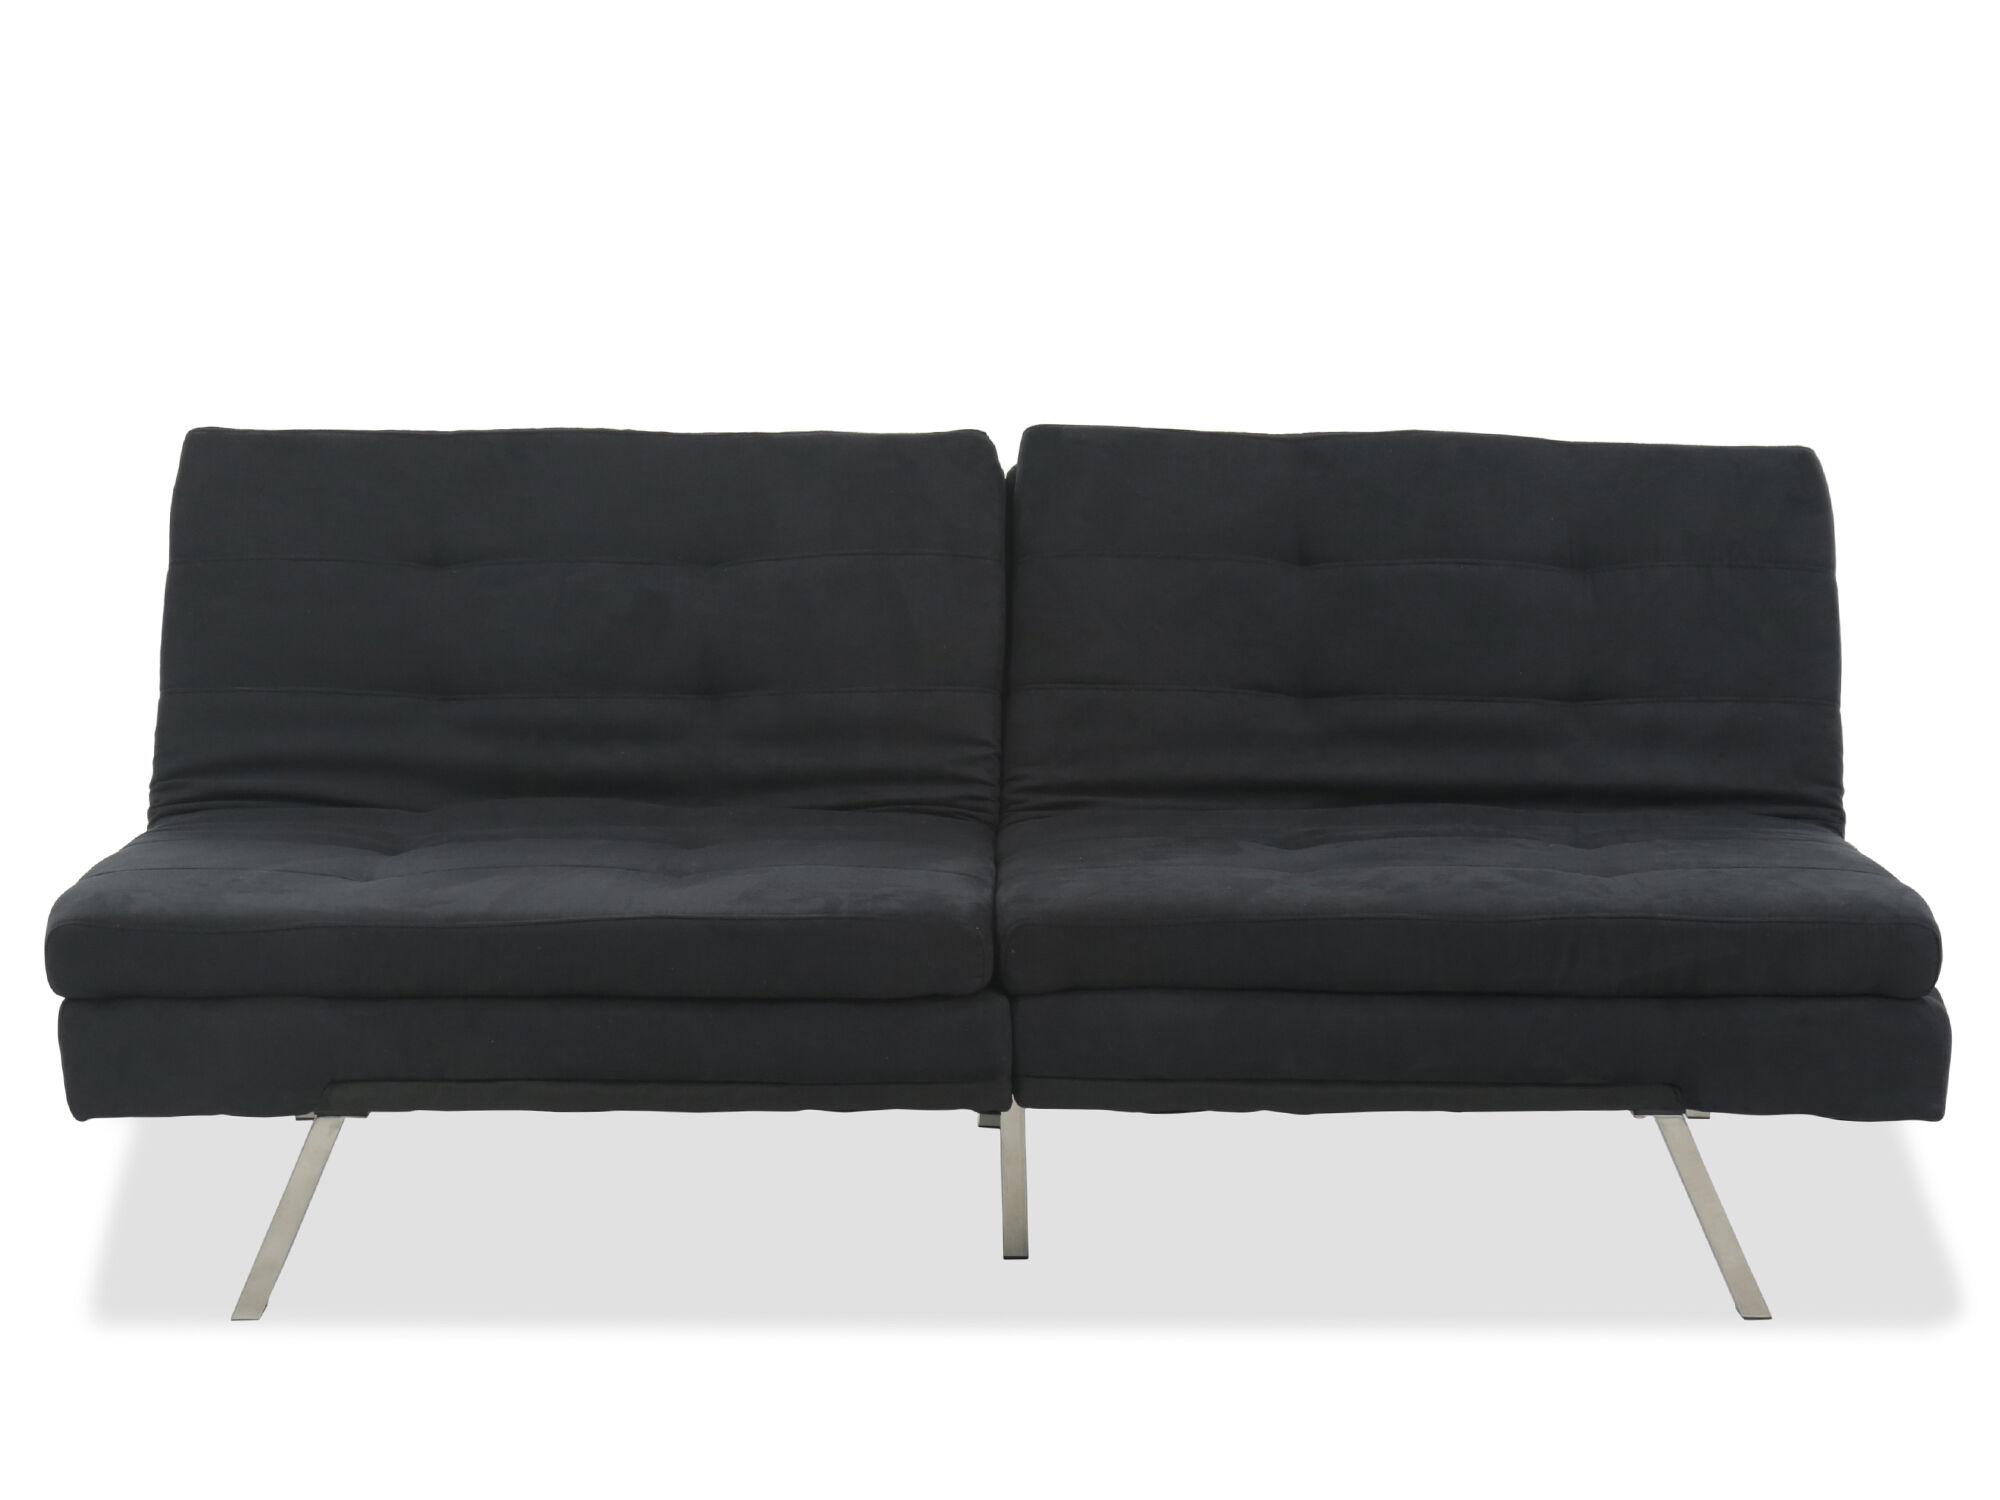 Images Microfiber Transitional 71u0026quot; Convertible Sofa ...